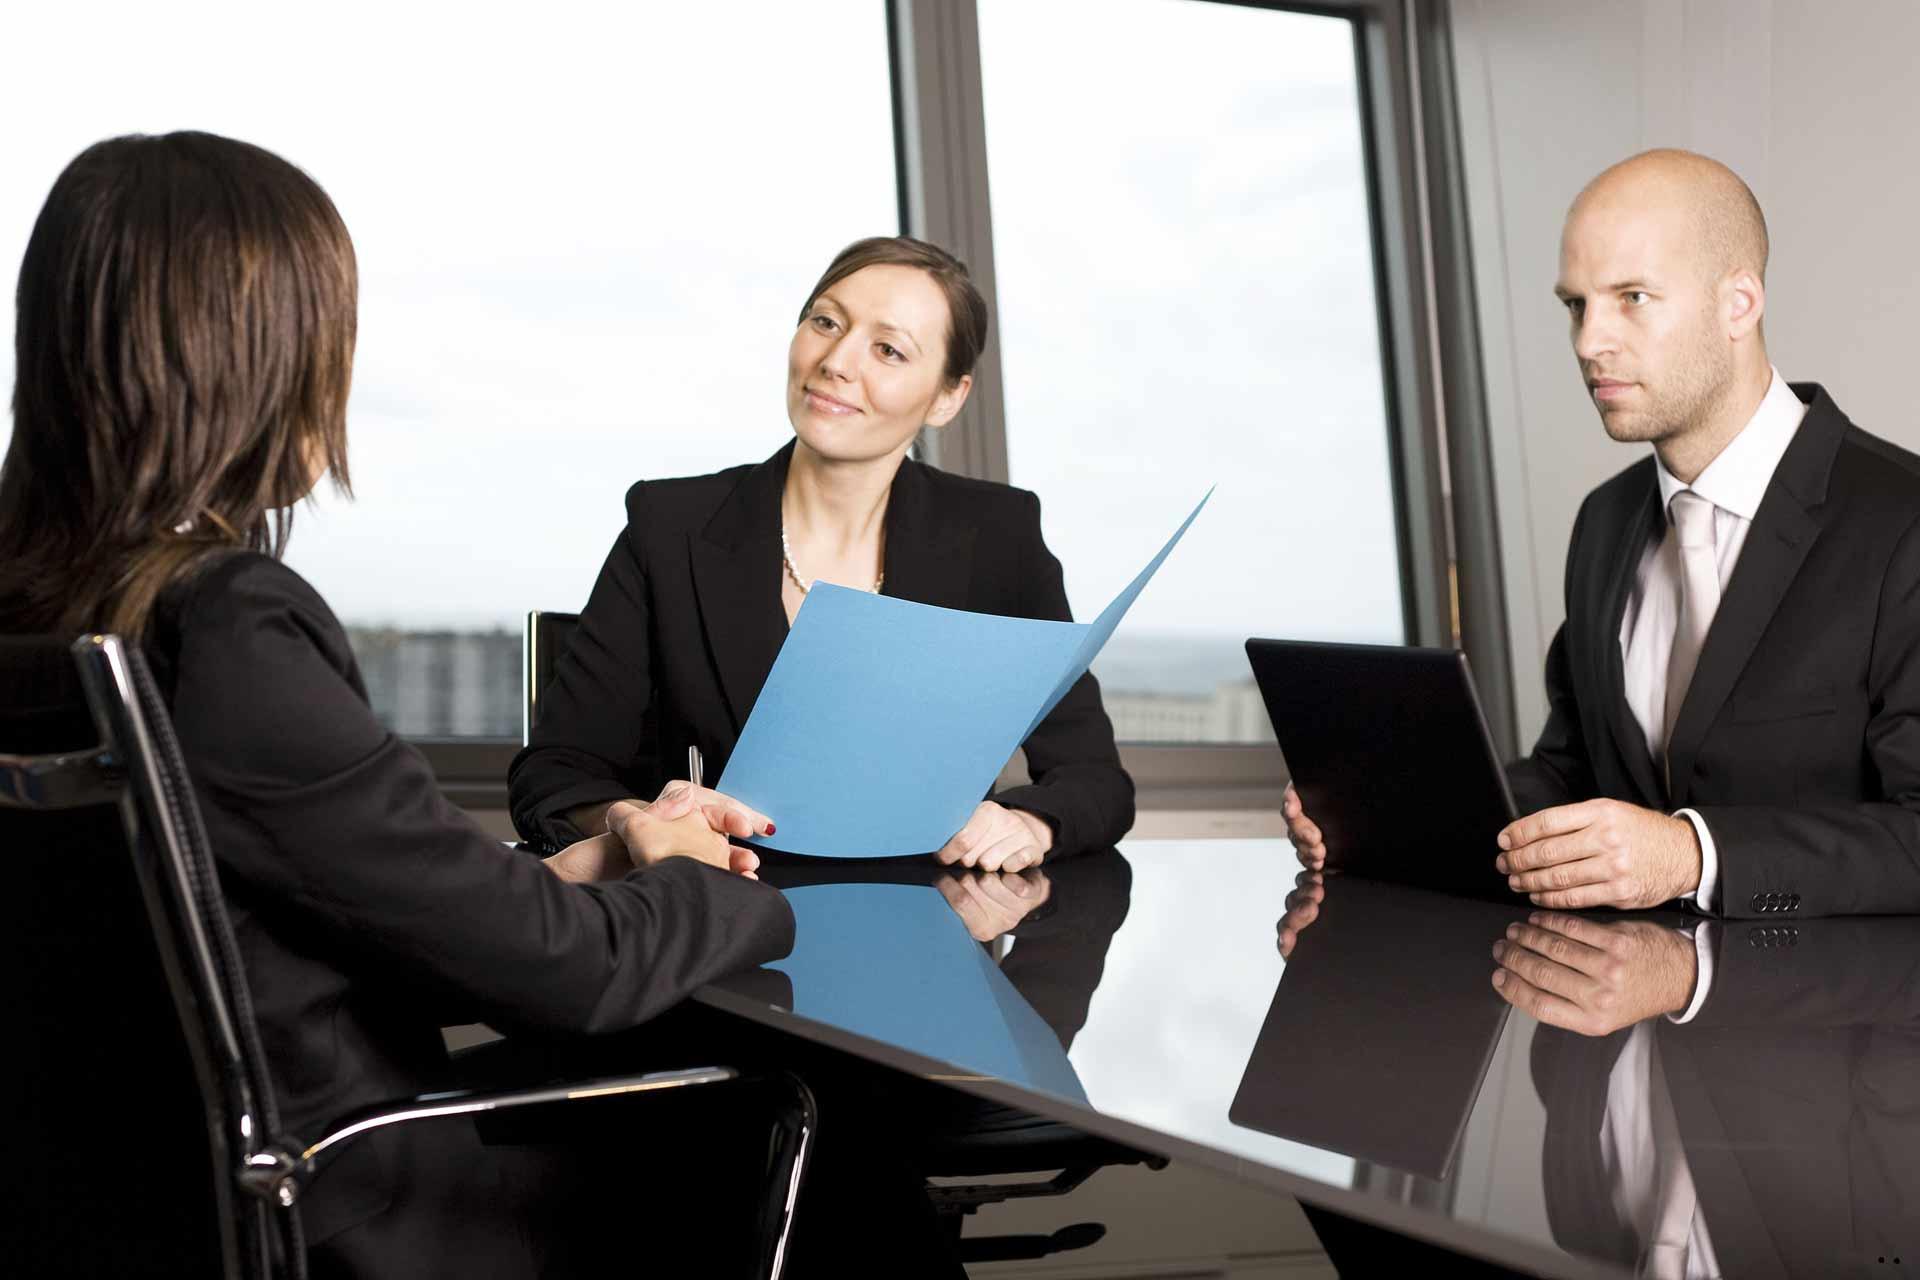 Вебинар: Оценка эффективности HR-департамента